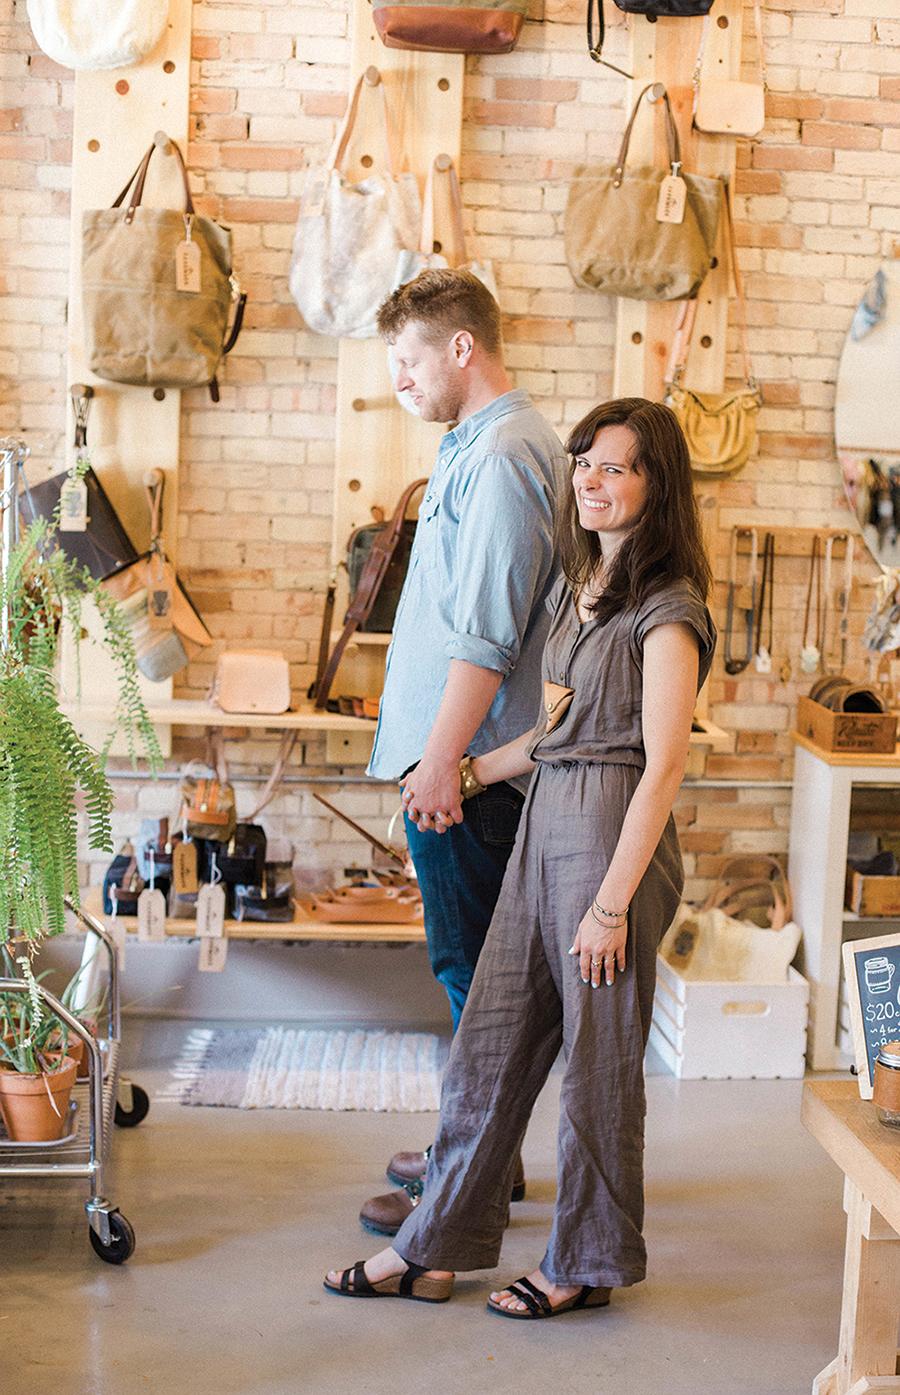 Gemini Handmade owners Marie Welcher & Jacob Vroon.